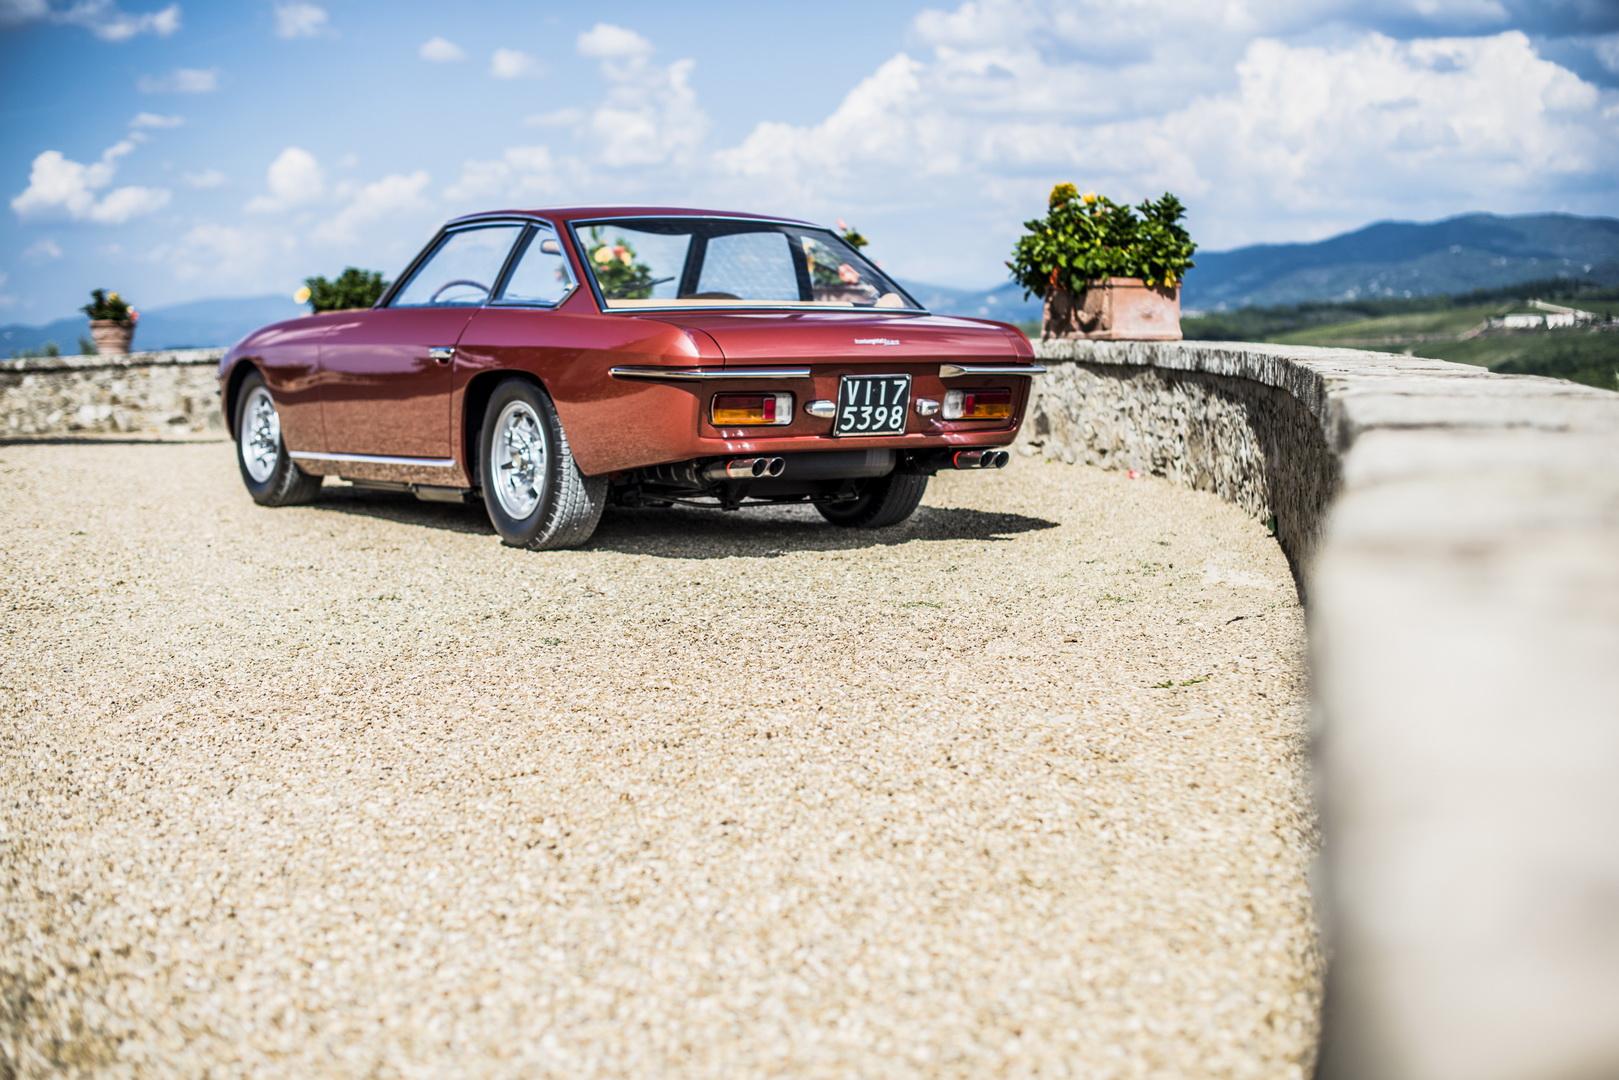 Lamborghini Islero and Espada 50th anniversary (32)